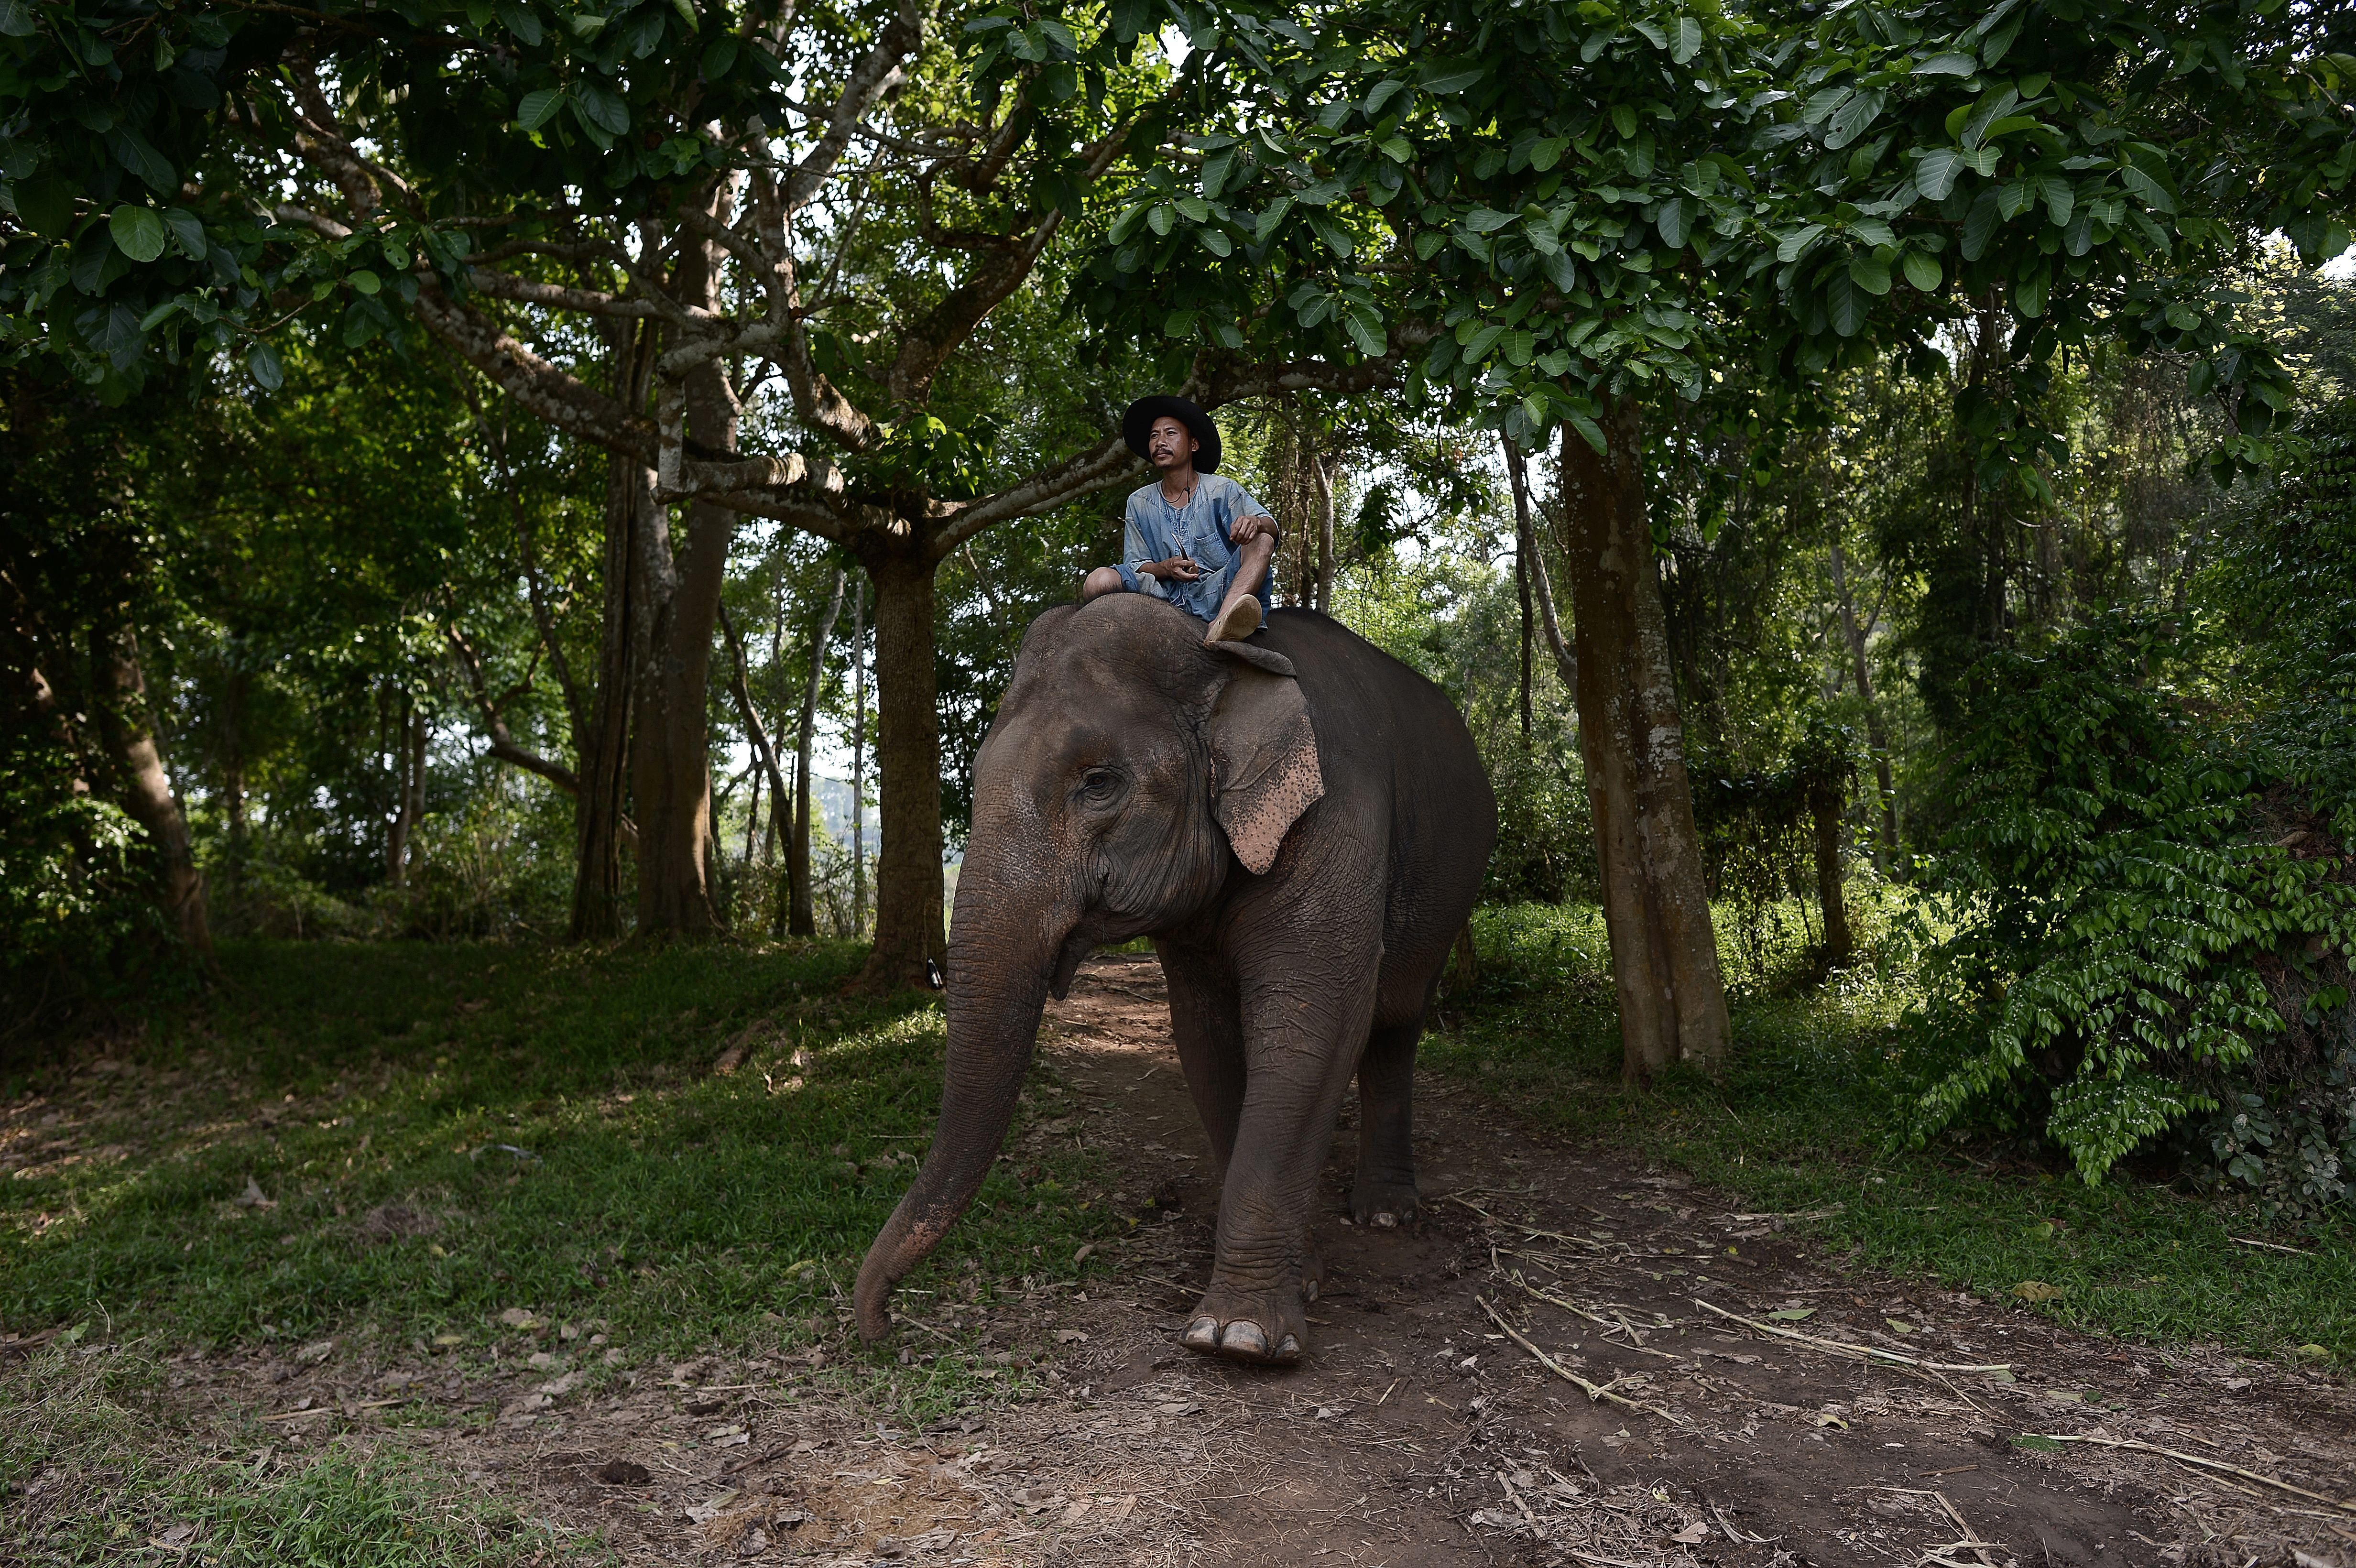 THAILAND-ANIMALS-GASTRONOMY